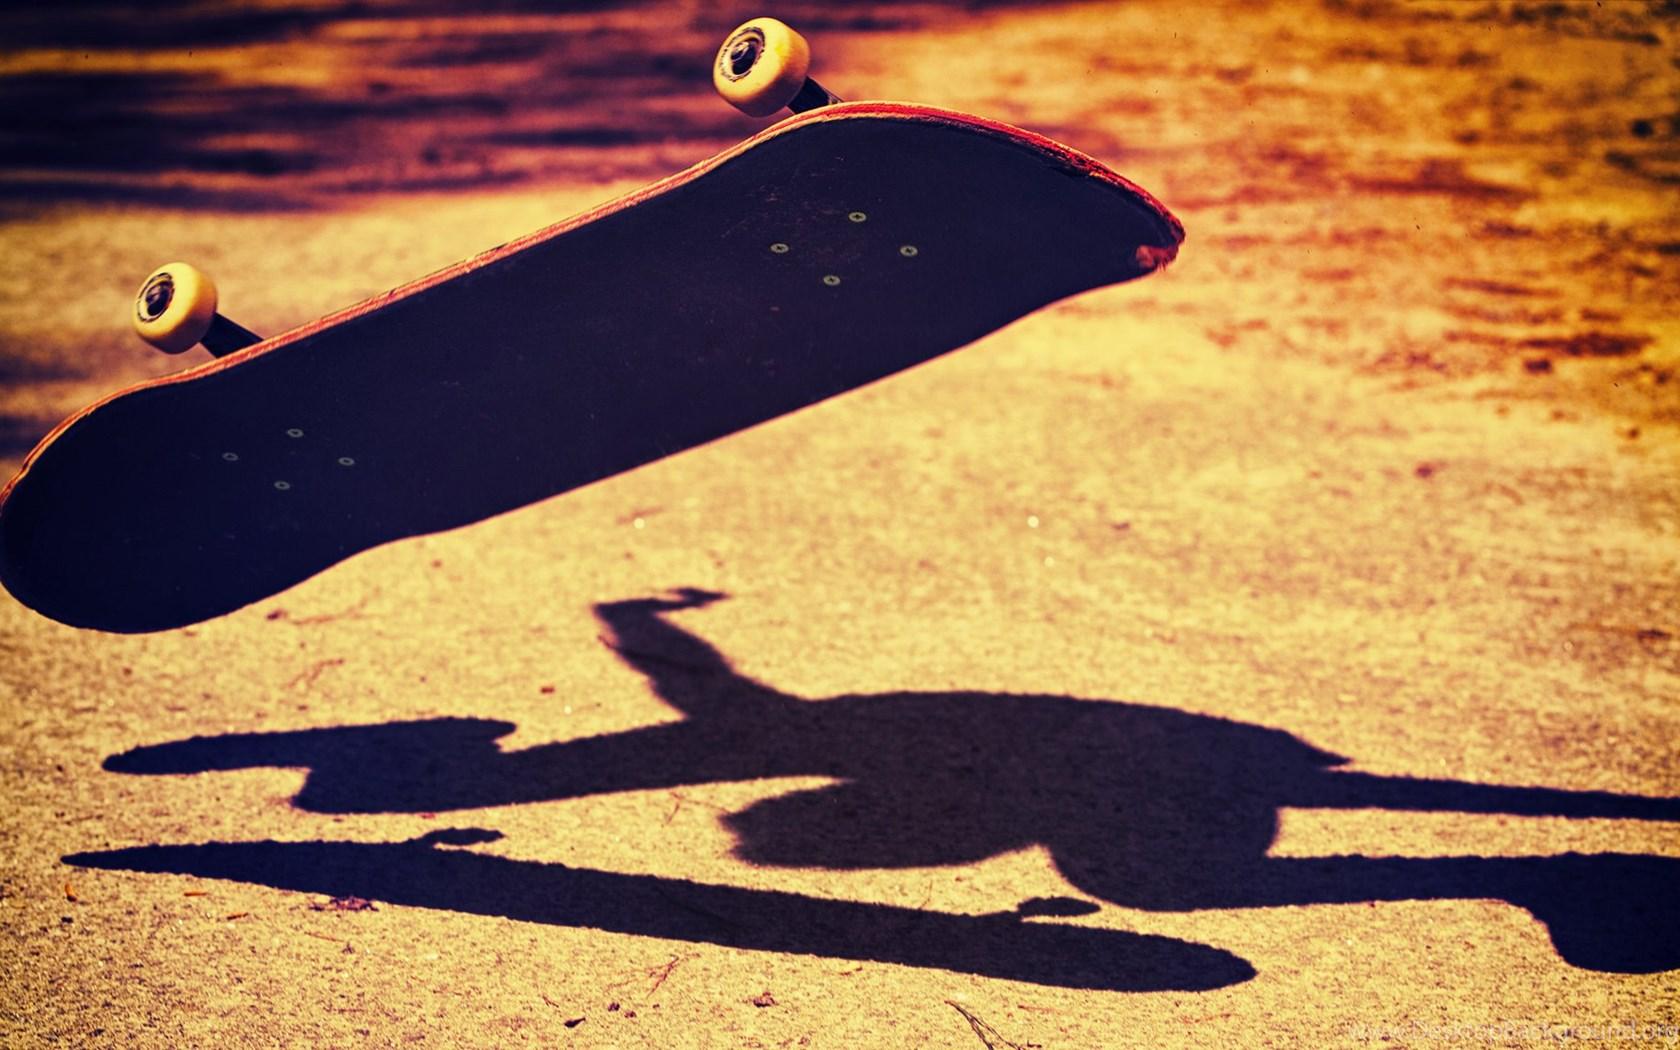 выражение скейтборд картинки на обои комиссий